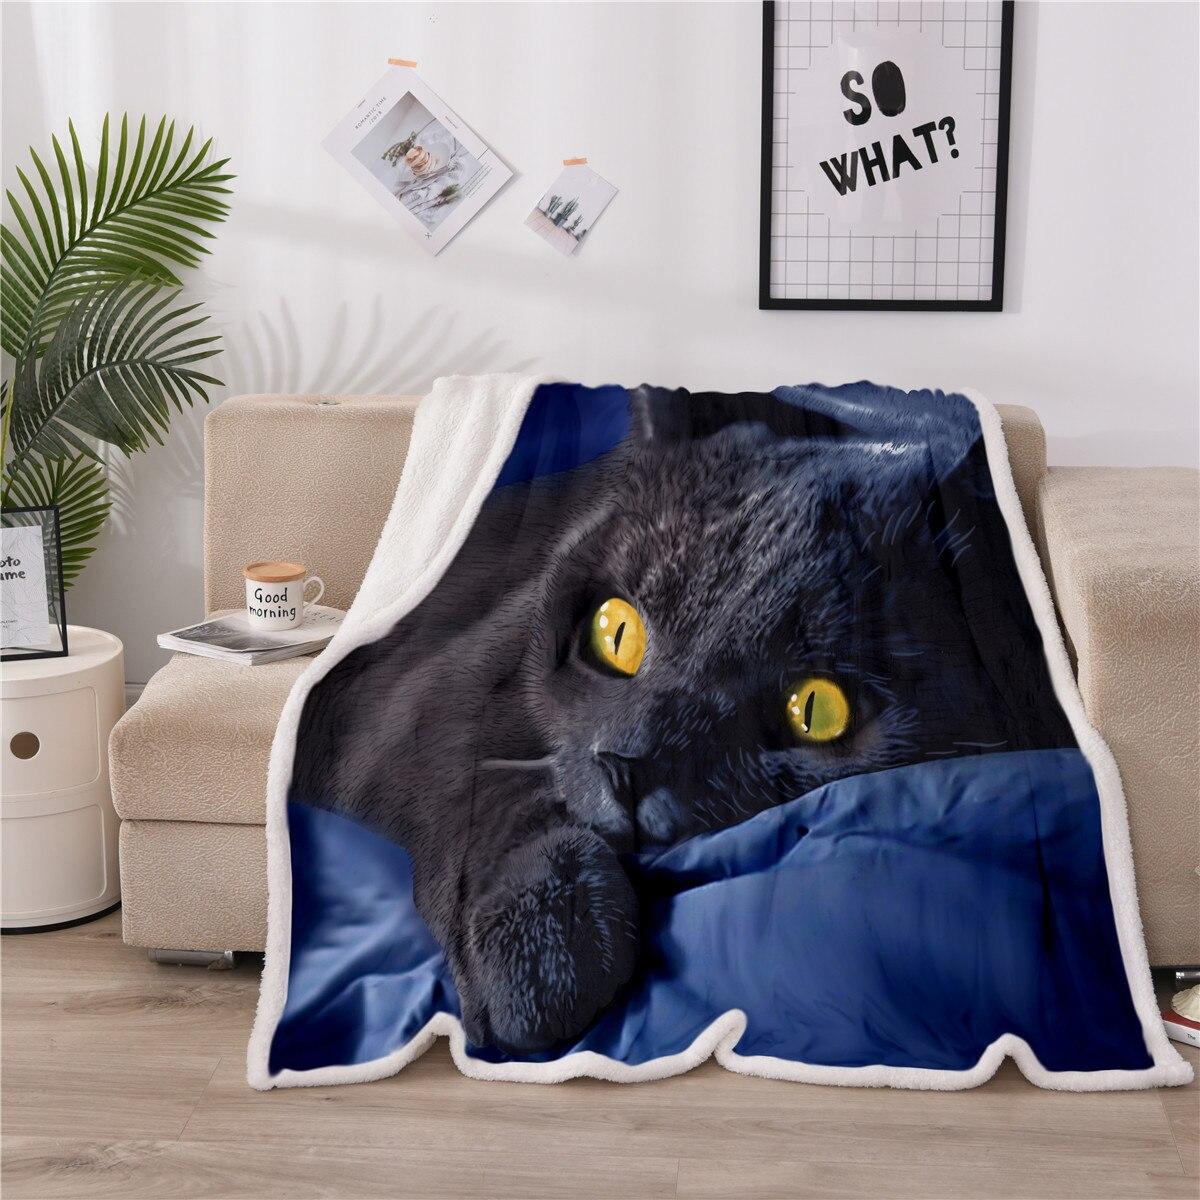 Cubierta de cama juegos de cama económicos gato caja de cartón de baloncesto textil hogar trineo de alces edredón cubierta para regalo árbol edredón muñeco de nieve colcha